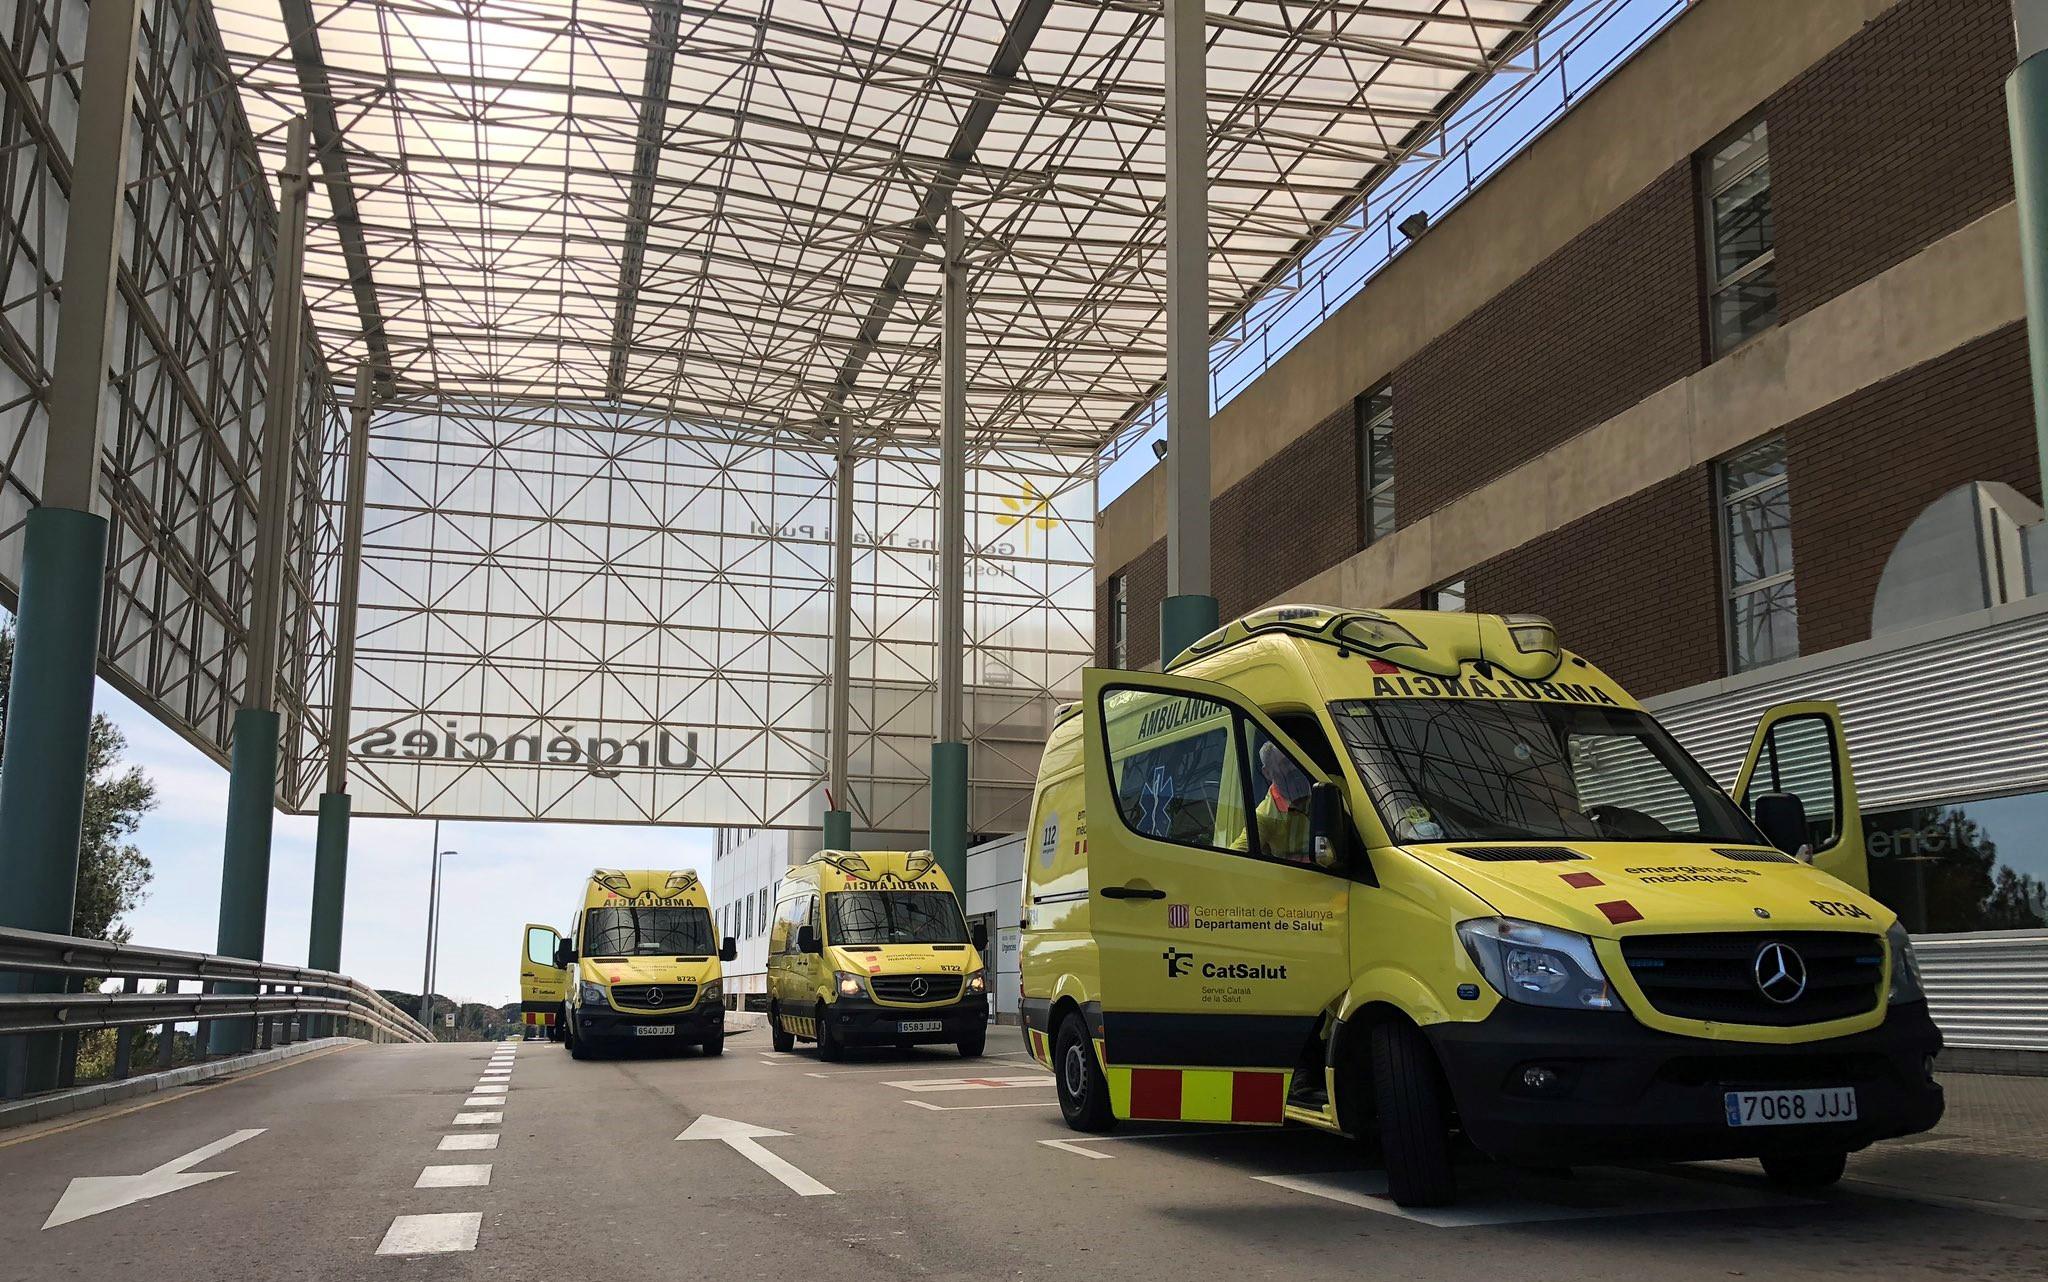 transport sanitari a Barcelona